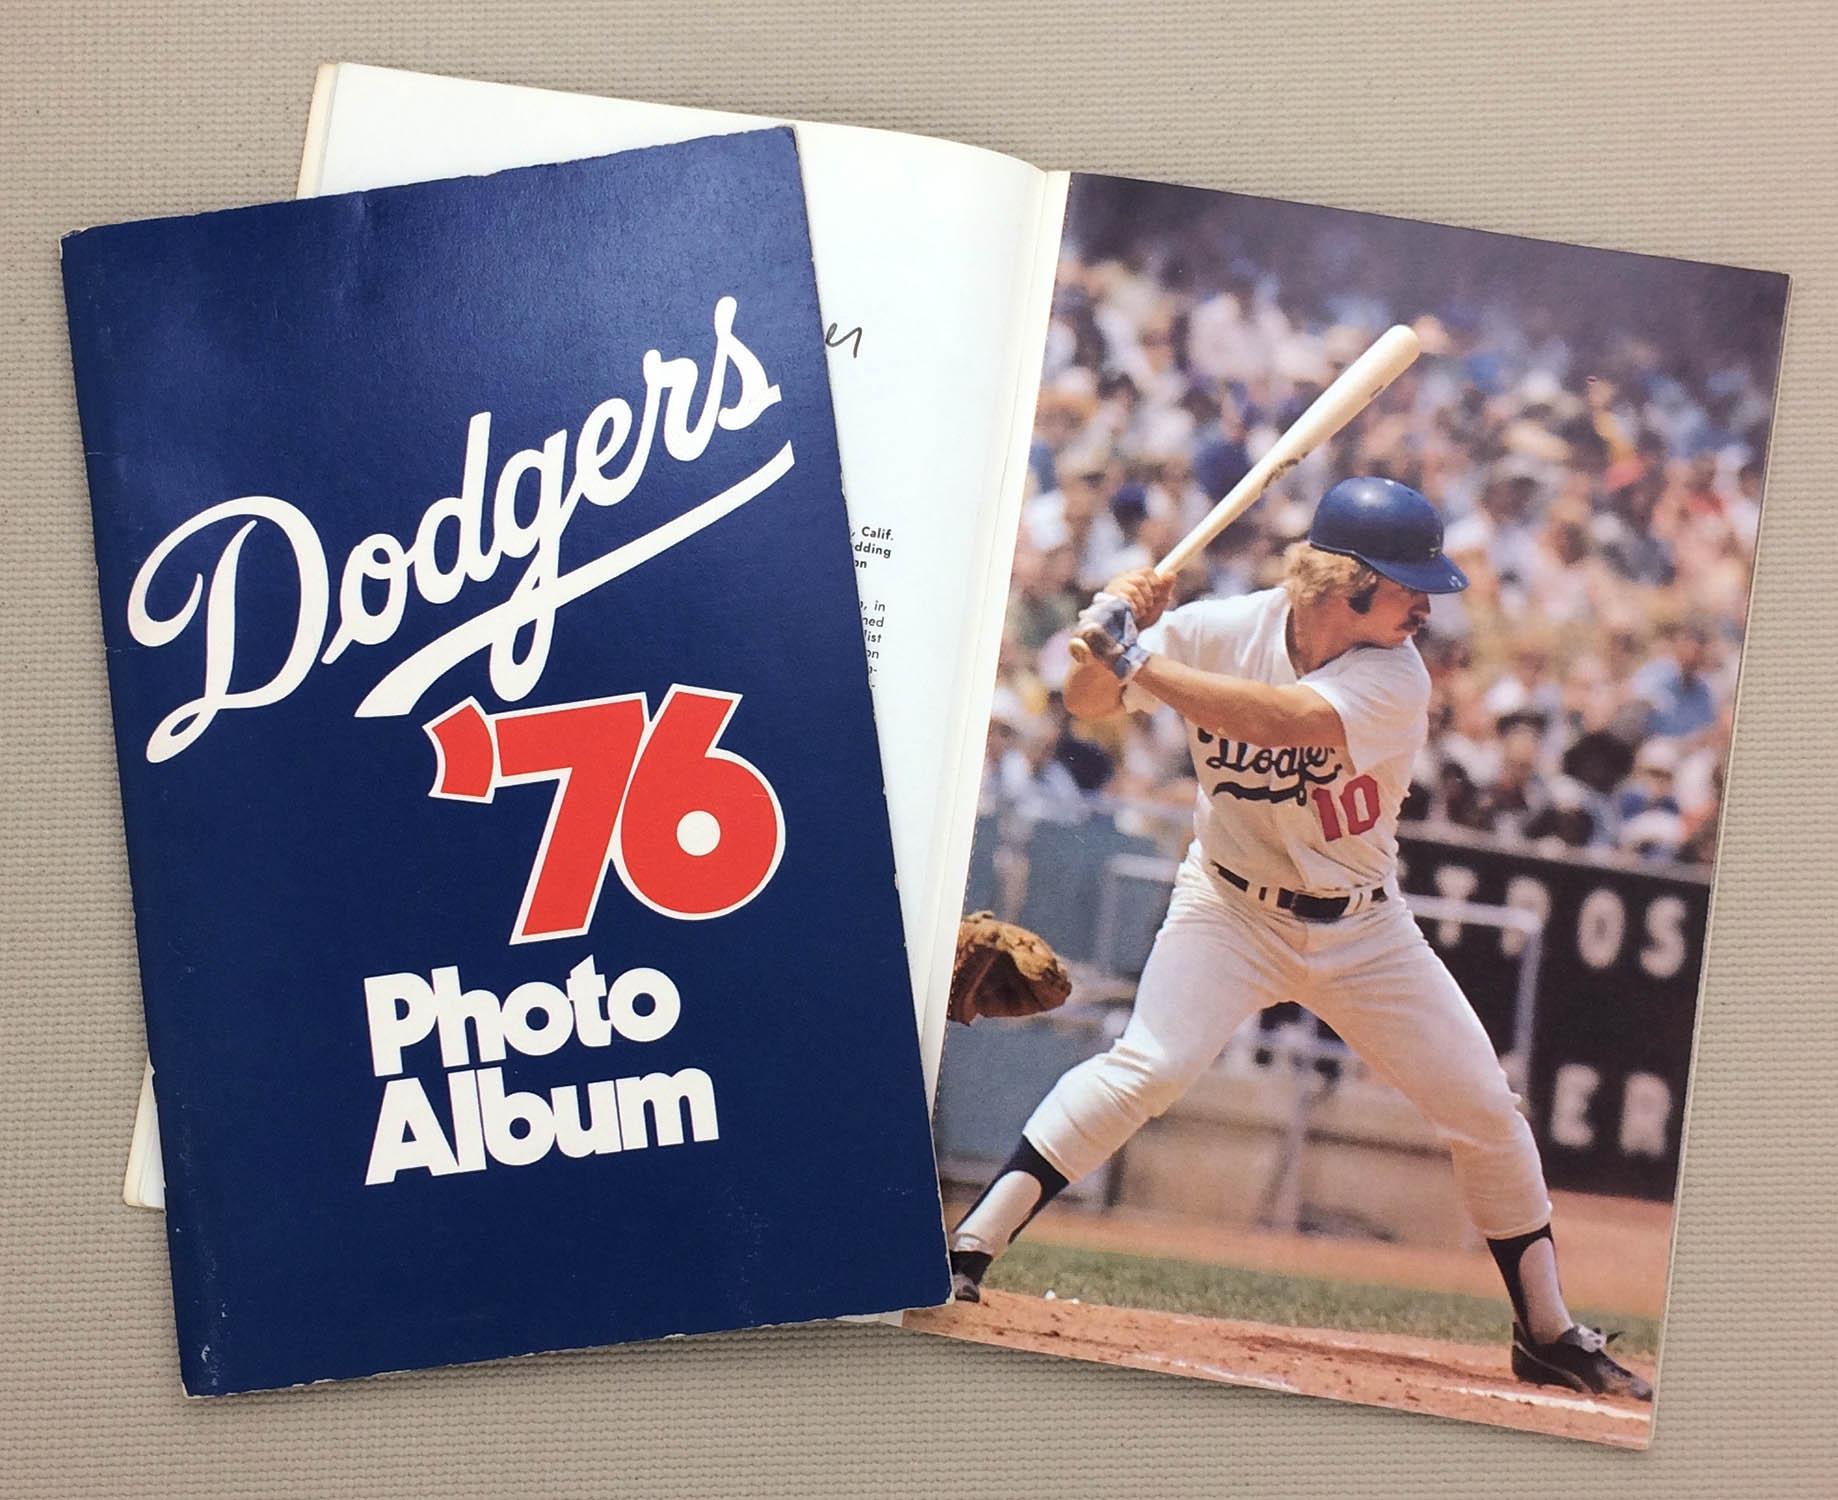 Los Angeles Dodgers 1976 Photo Album